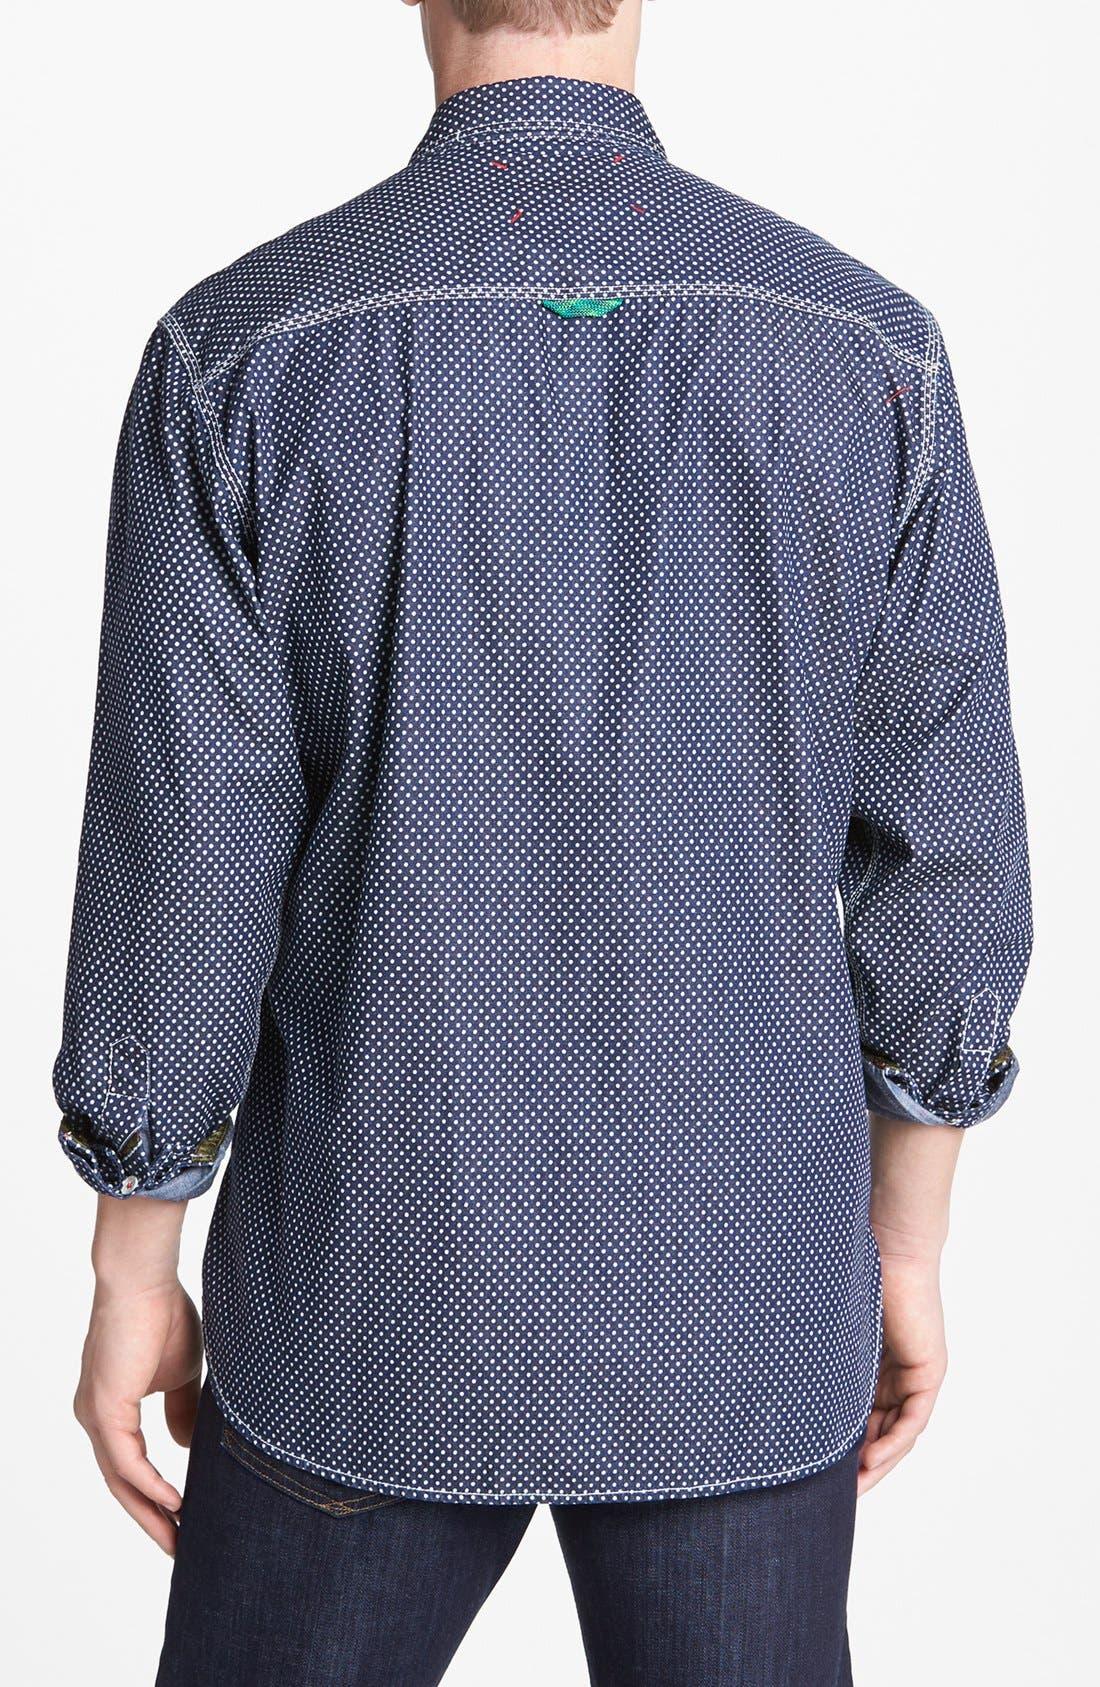 Alternate Image 3  - Robert Graham 'Snipe' Tailored Fit Sport Shirt